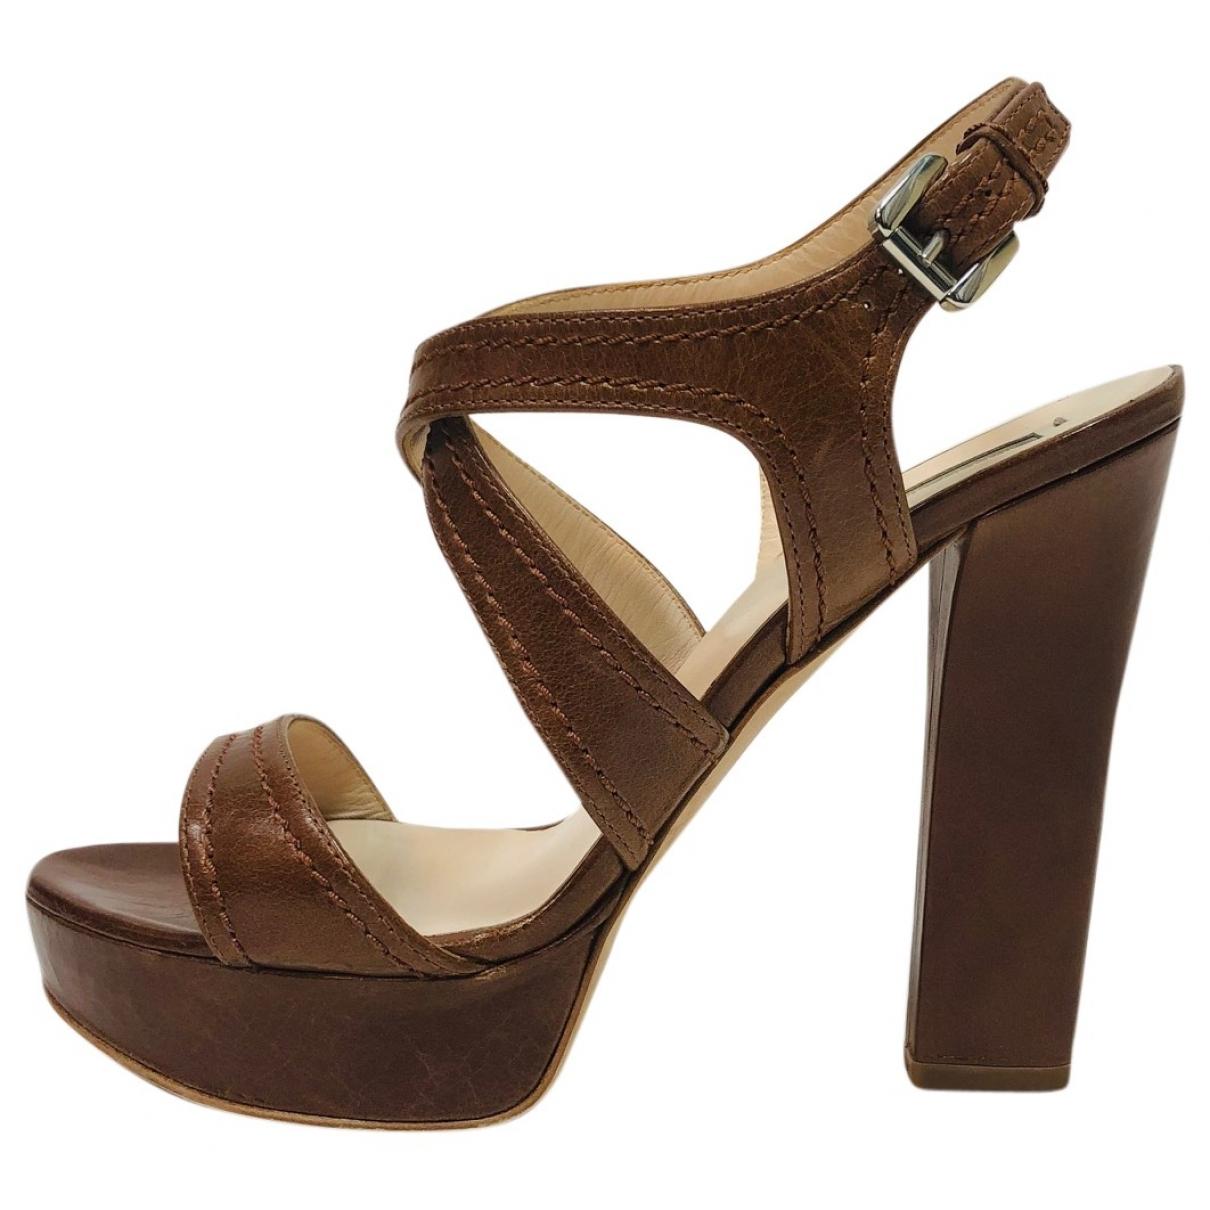 Giorgio Armani \N Brown Leather Sandals for Women 36 EU